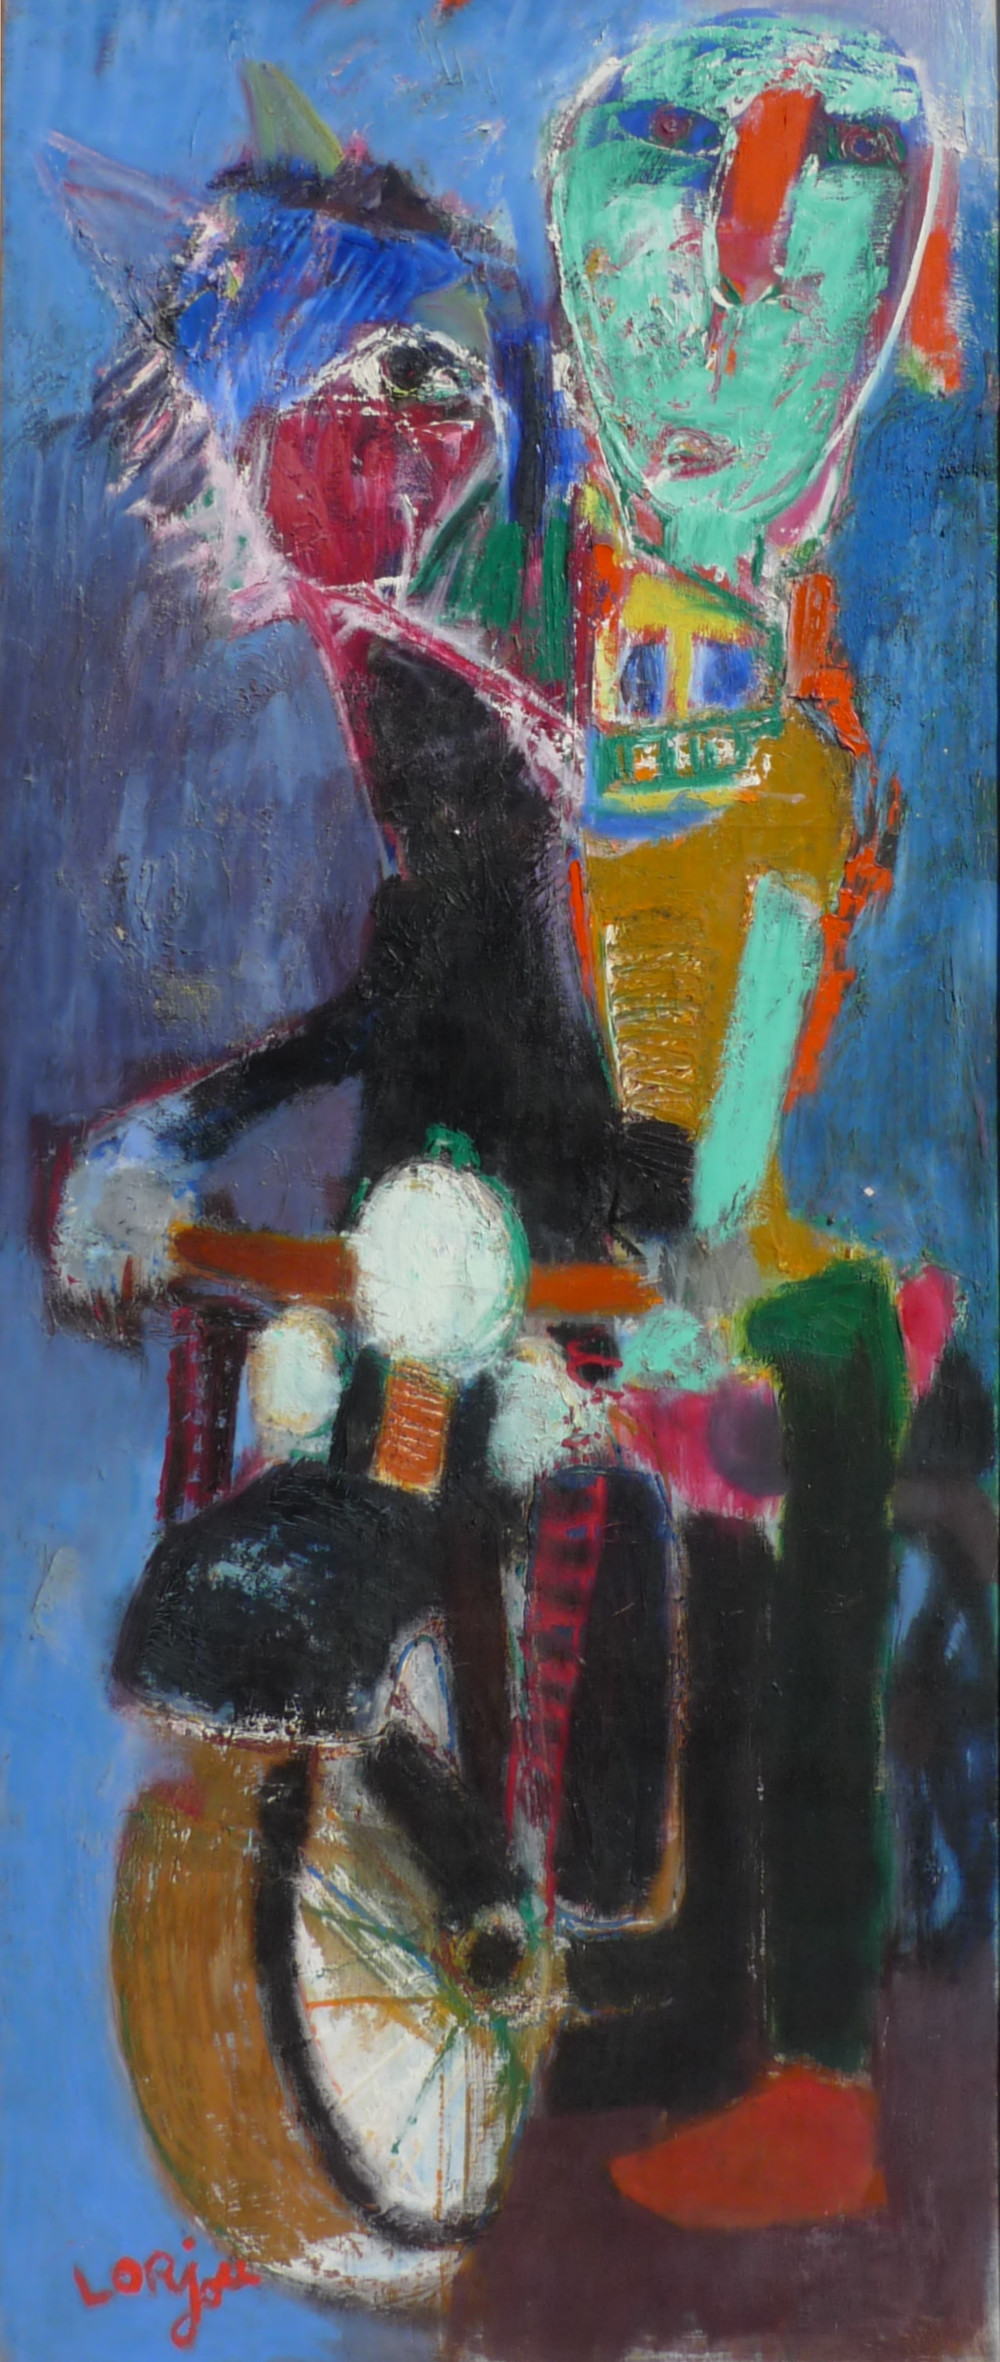 Centaur (c.1963-64)